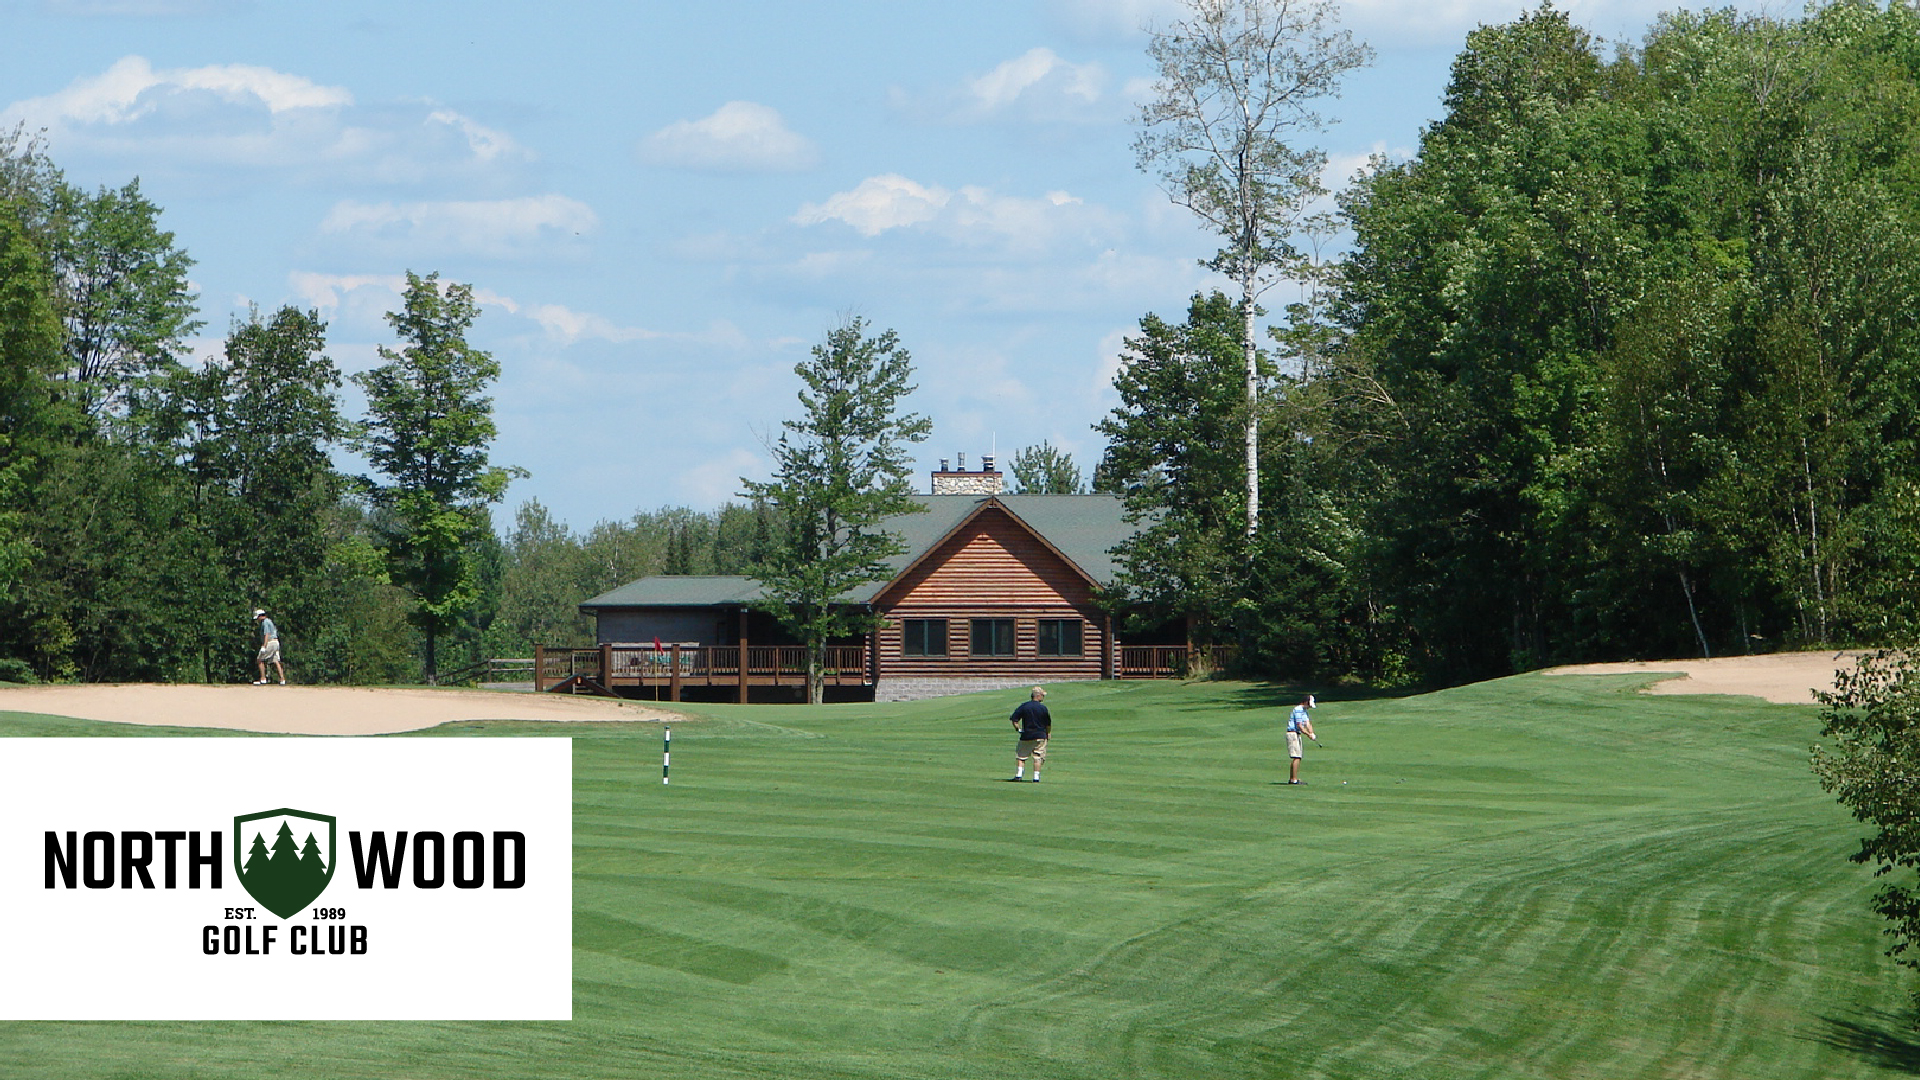 Northwood-Golf-Club-Green-Golf-Partners